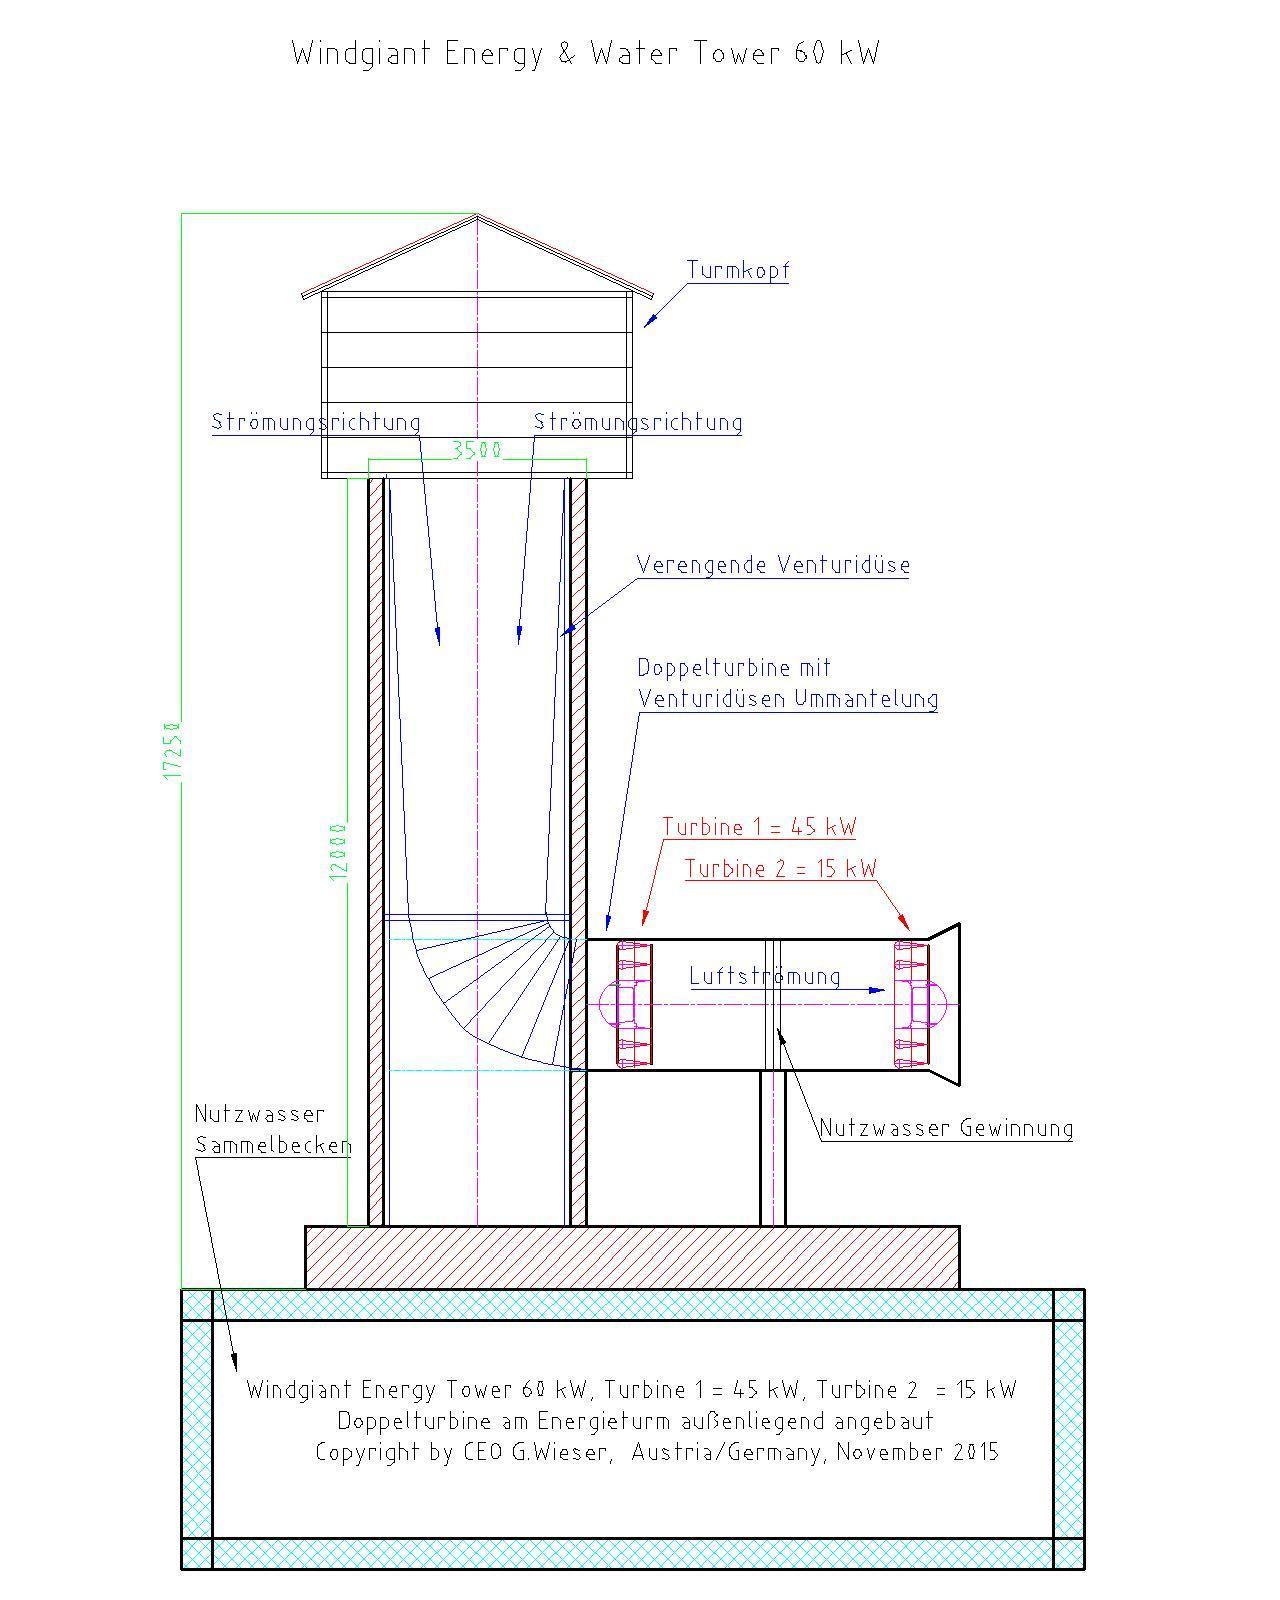 Energieturm-60_kW-_23.Nov.2015